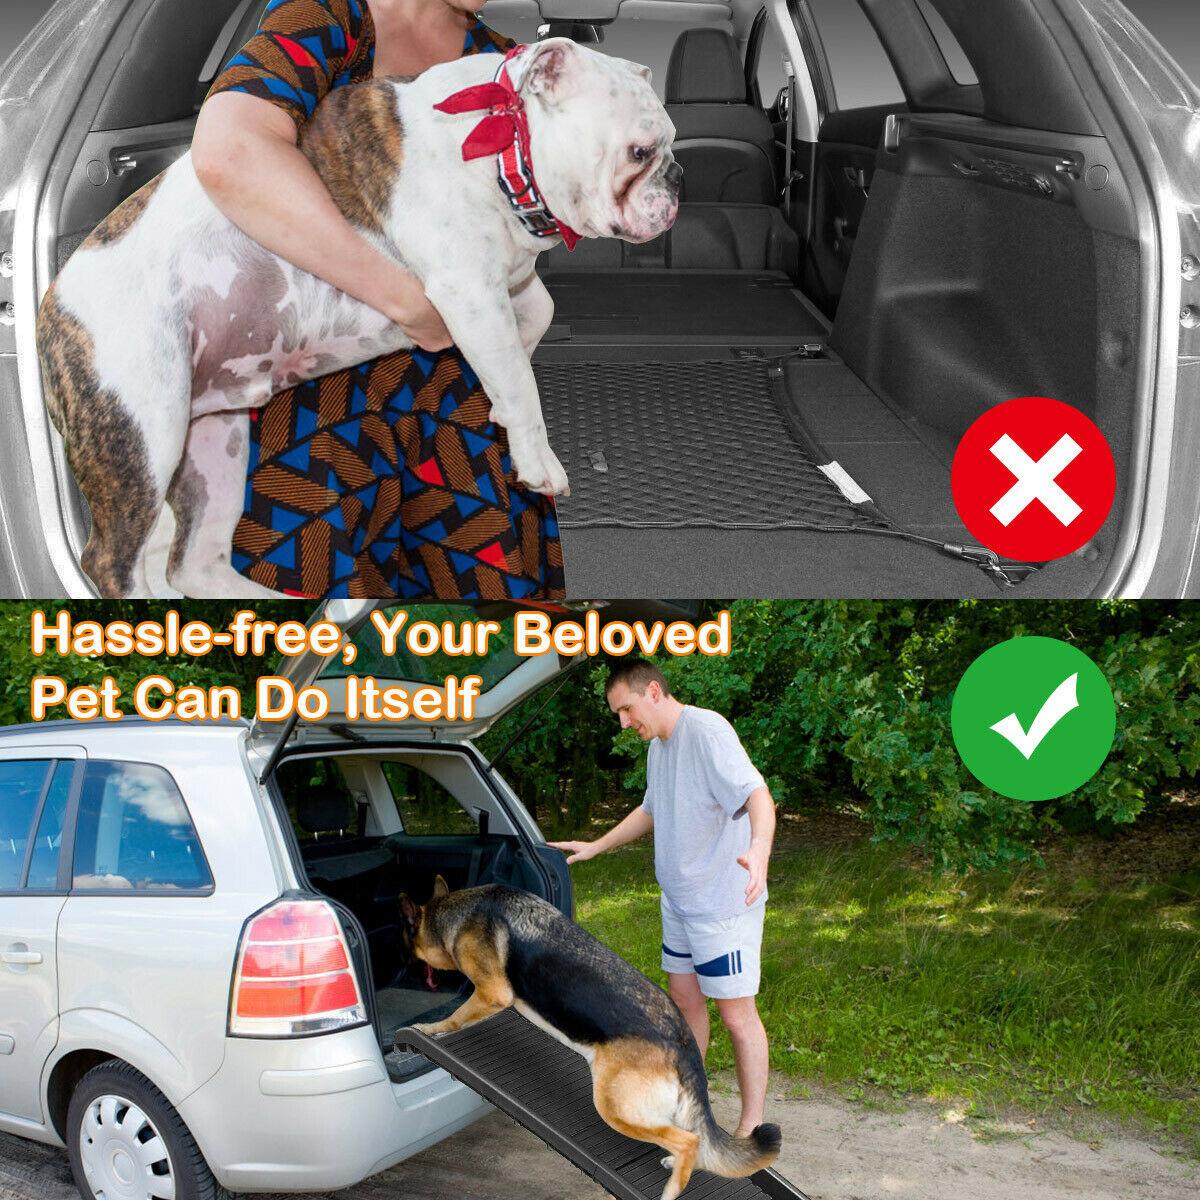 61 Folding Portable Lightweight Non Slip Dog Cat Pet Ramp High Traction Non Slip Rubberized Walking Surface Pet Ramp Dog Doors Ramps Aliexpress